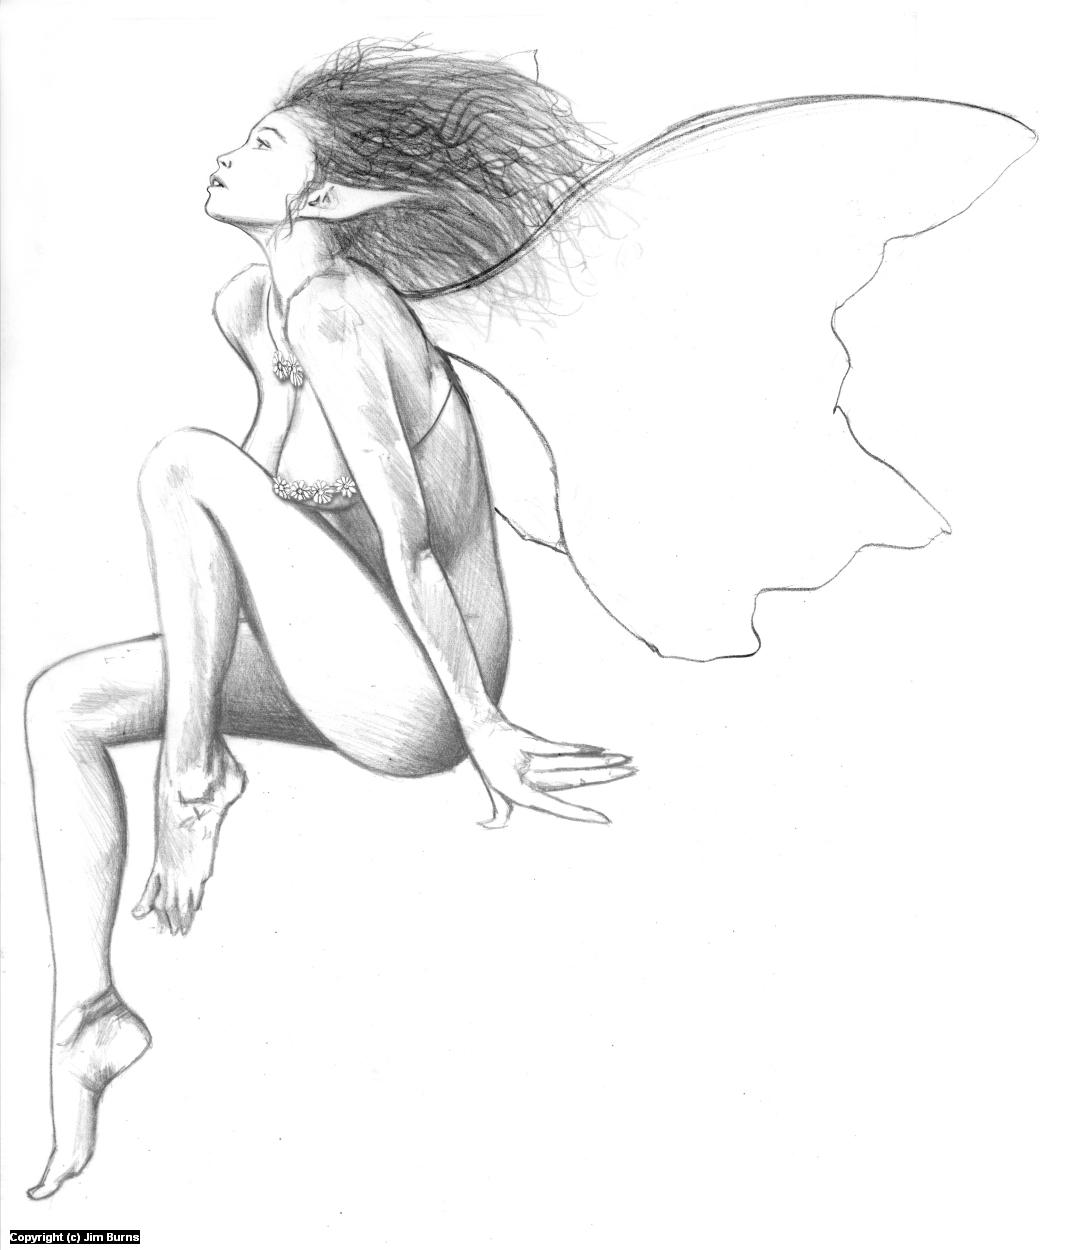 'Sweet Fairy' Artwork by Jim Burns